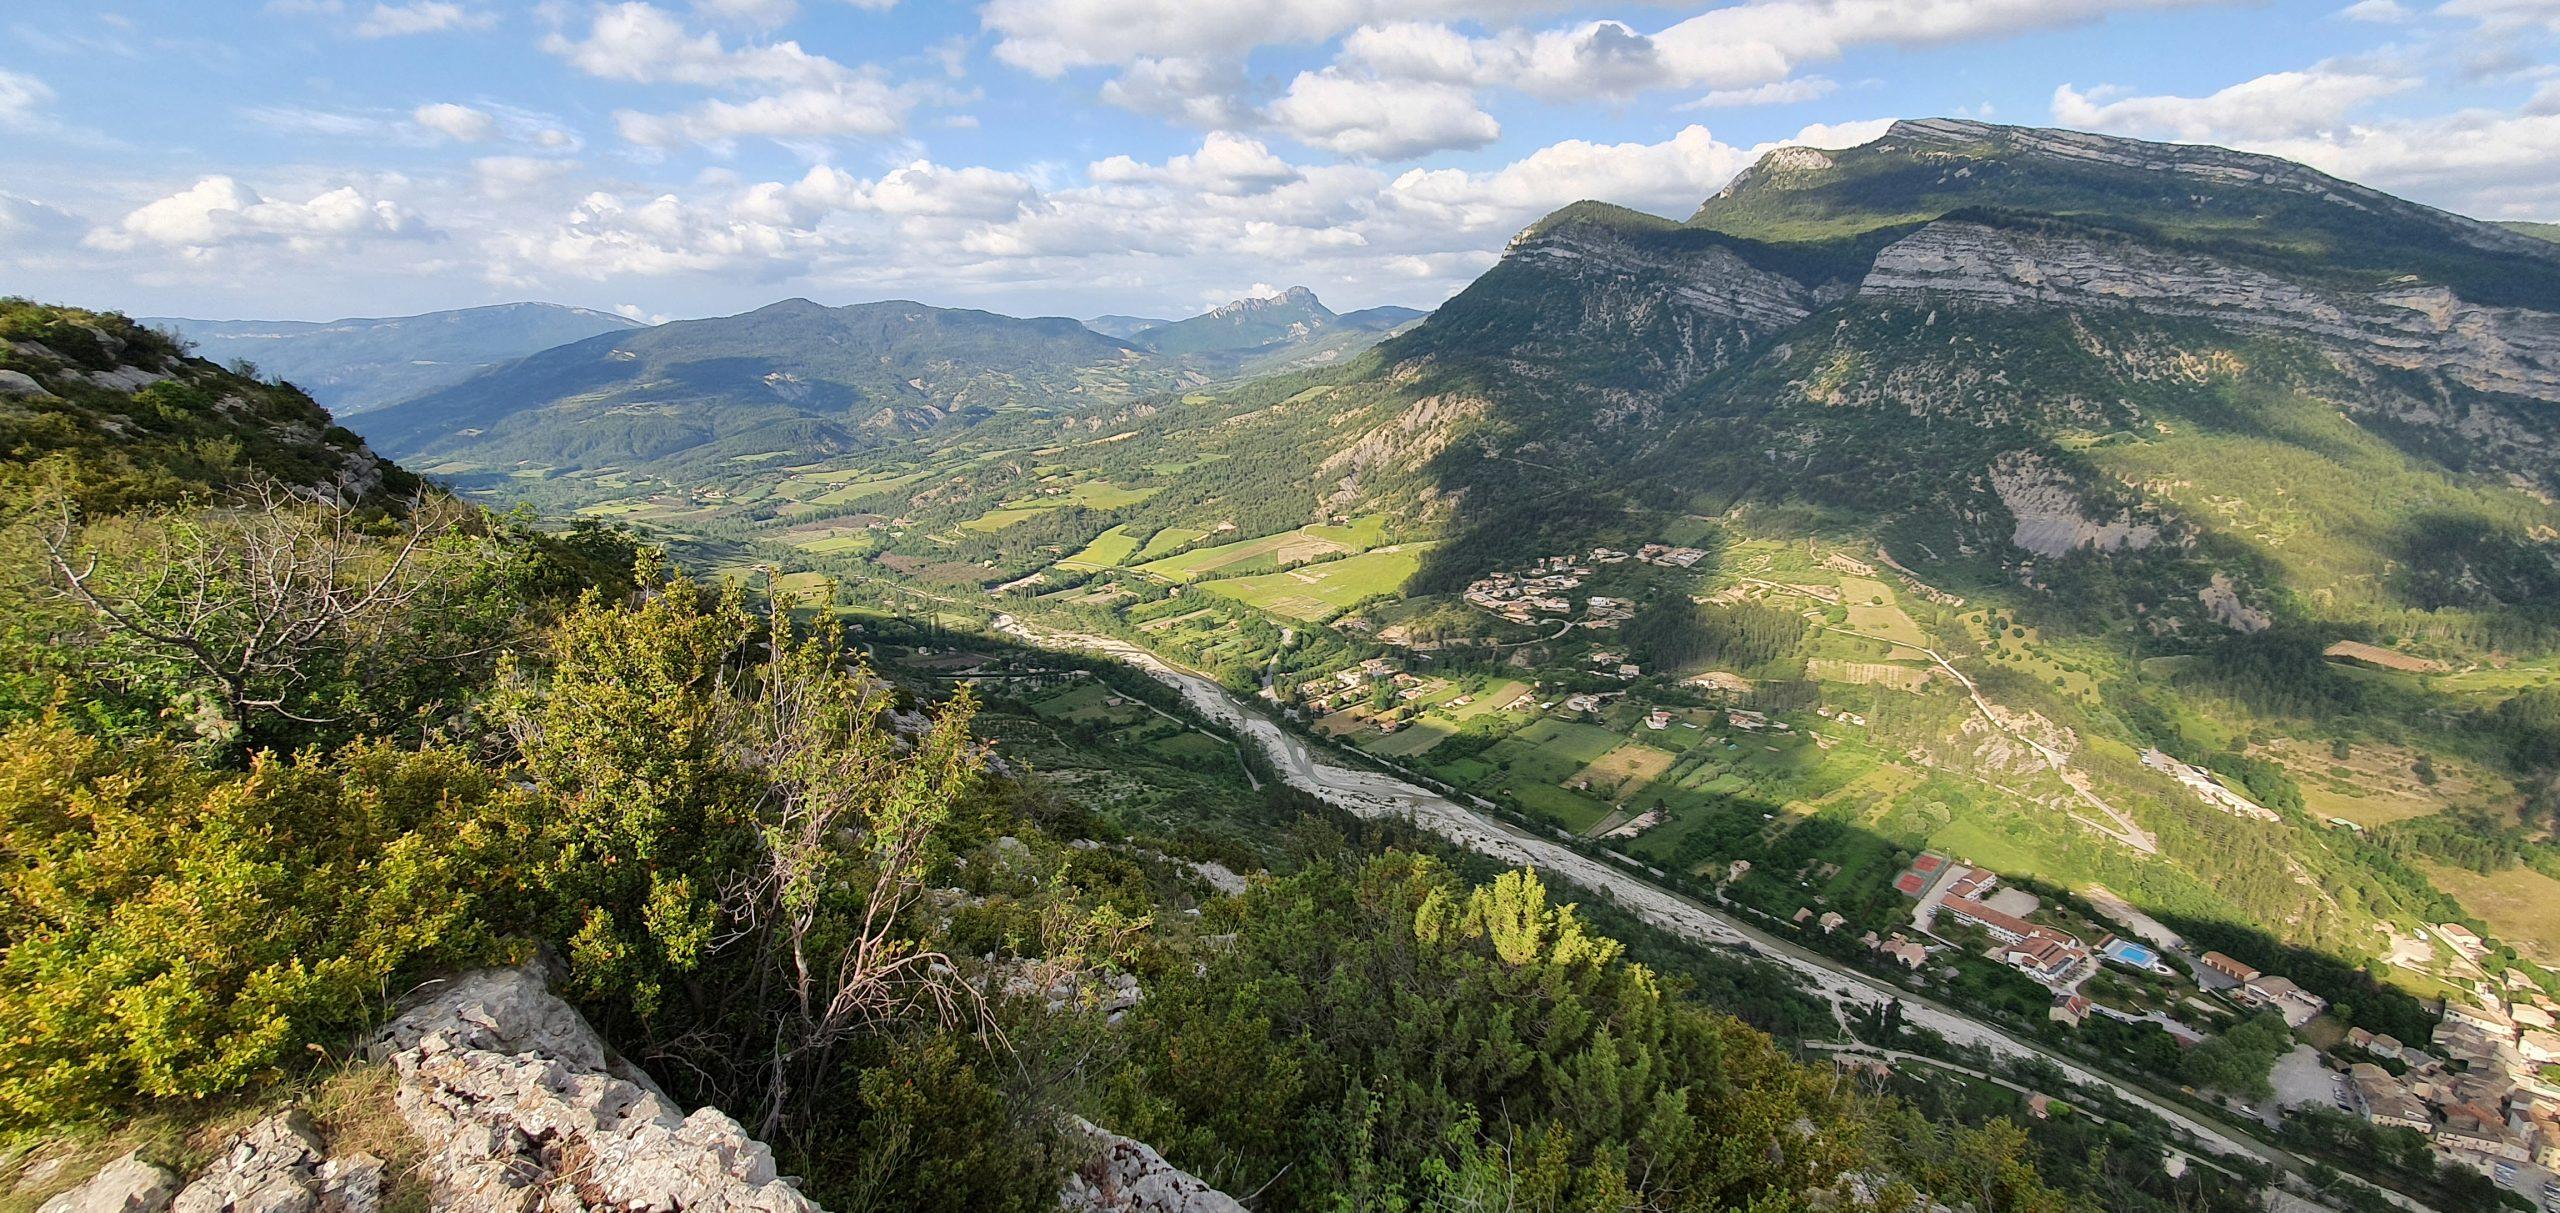 3 juin : Drôme provençale